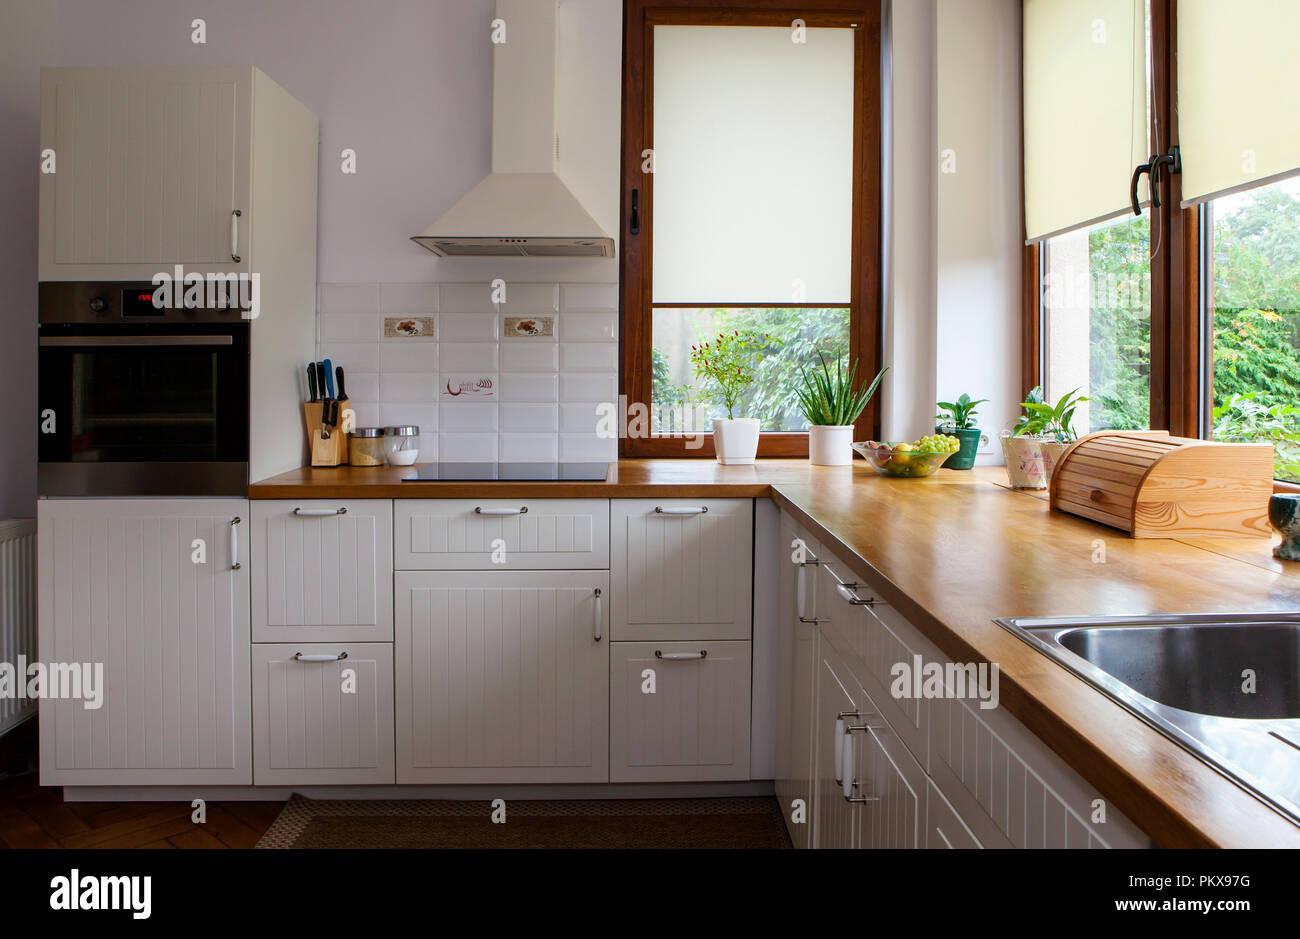 Interior of white modern kitchen - Stock Image